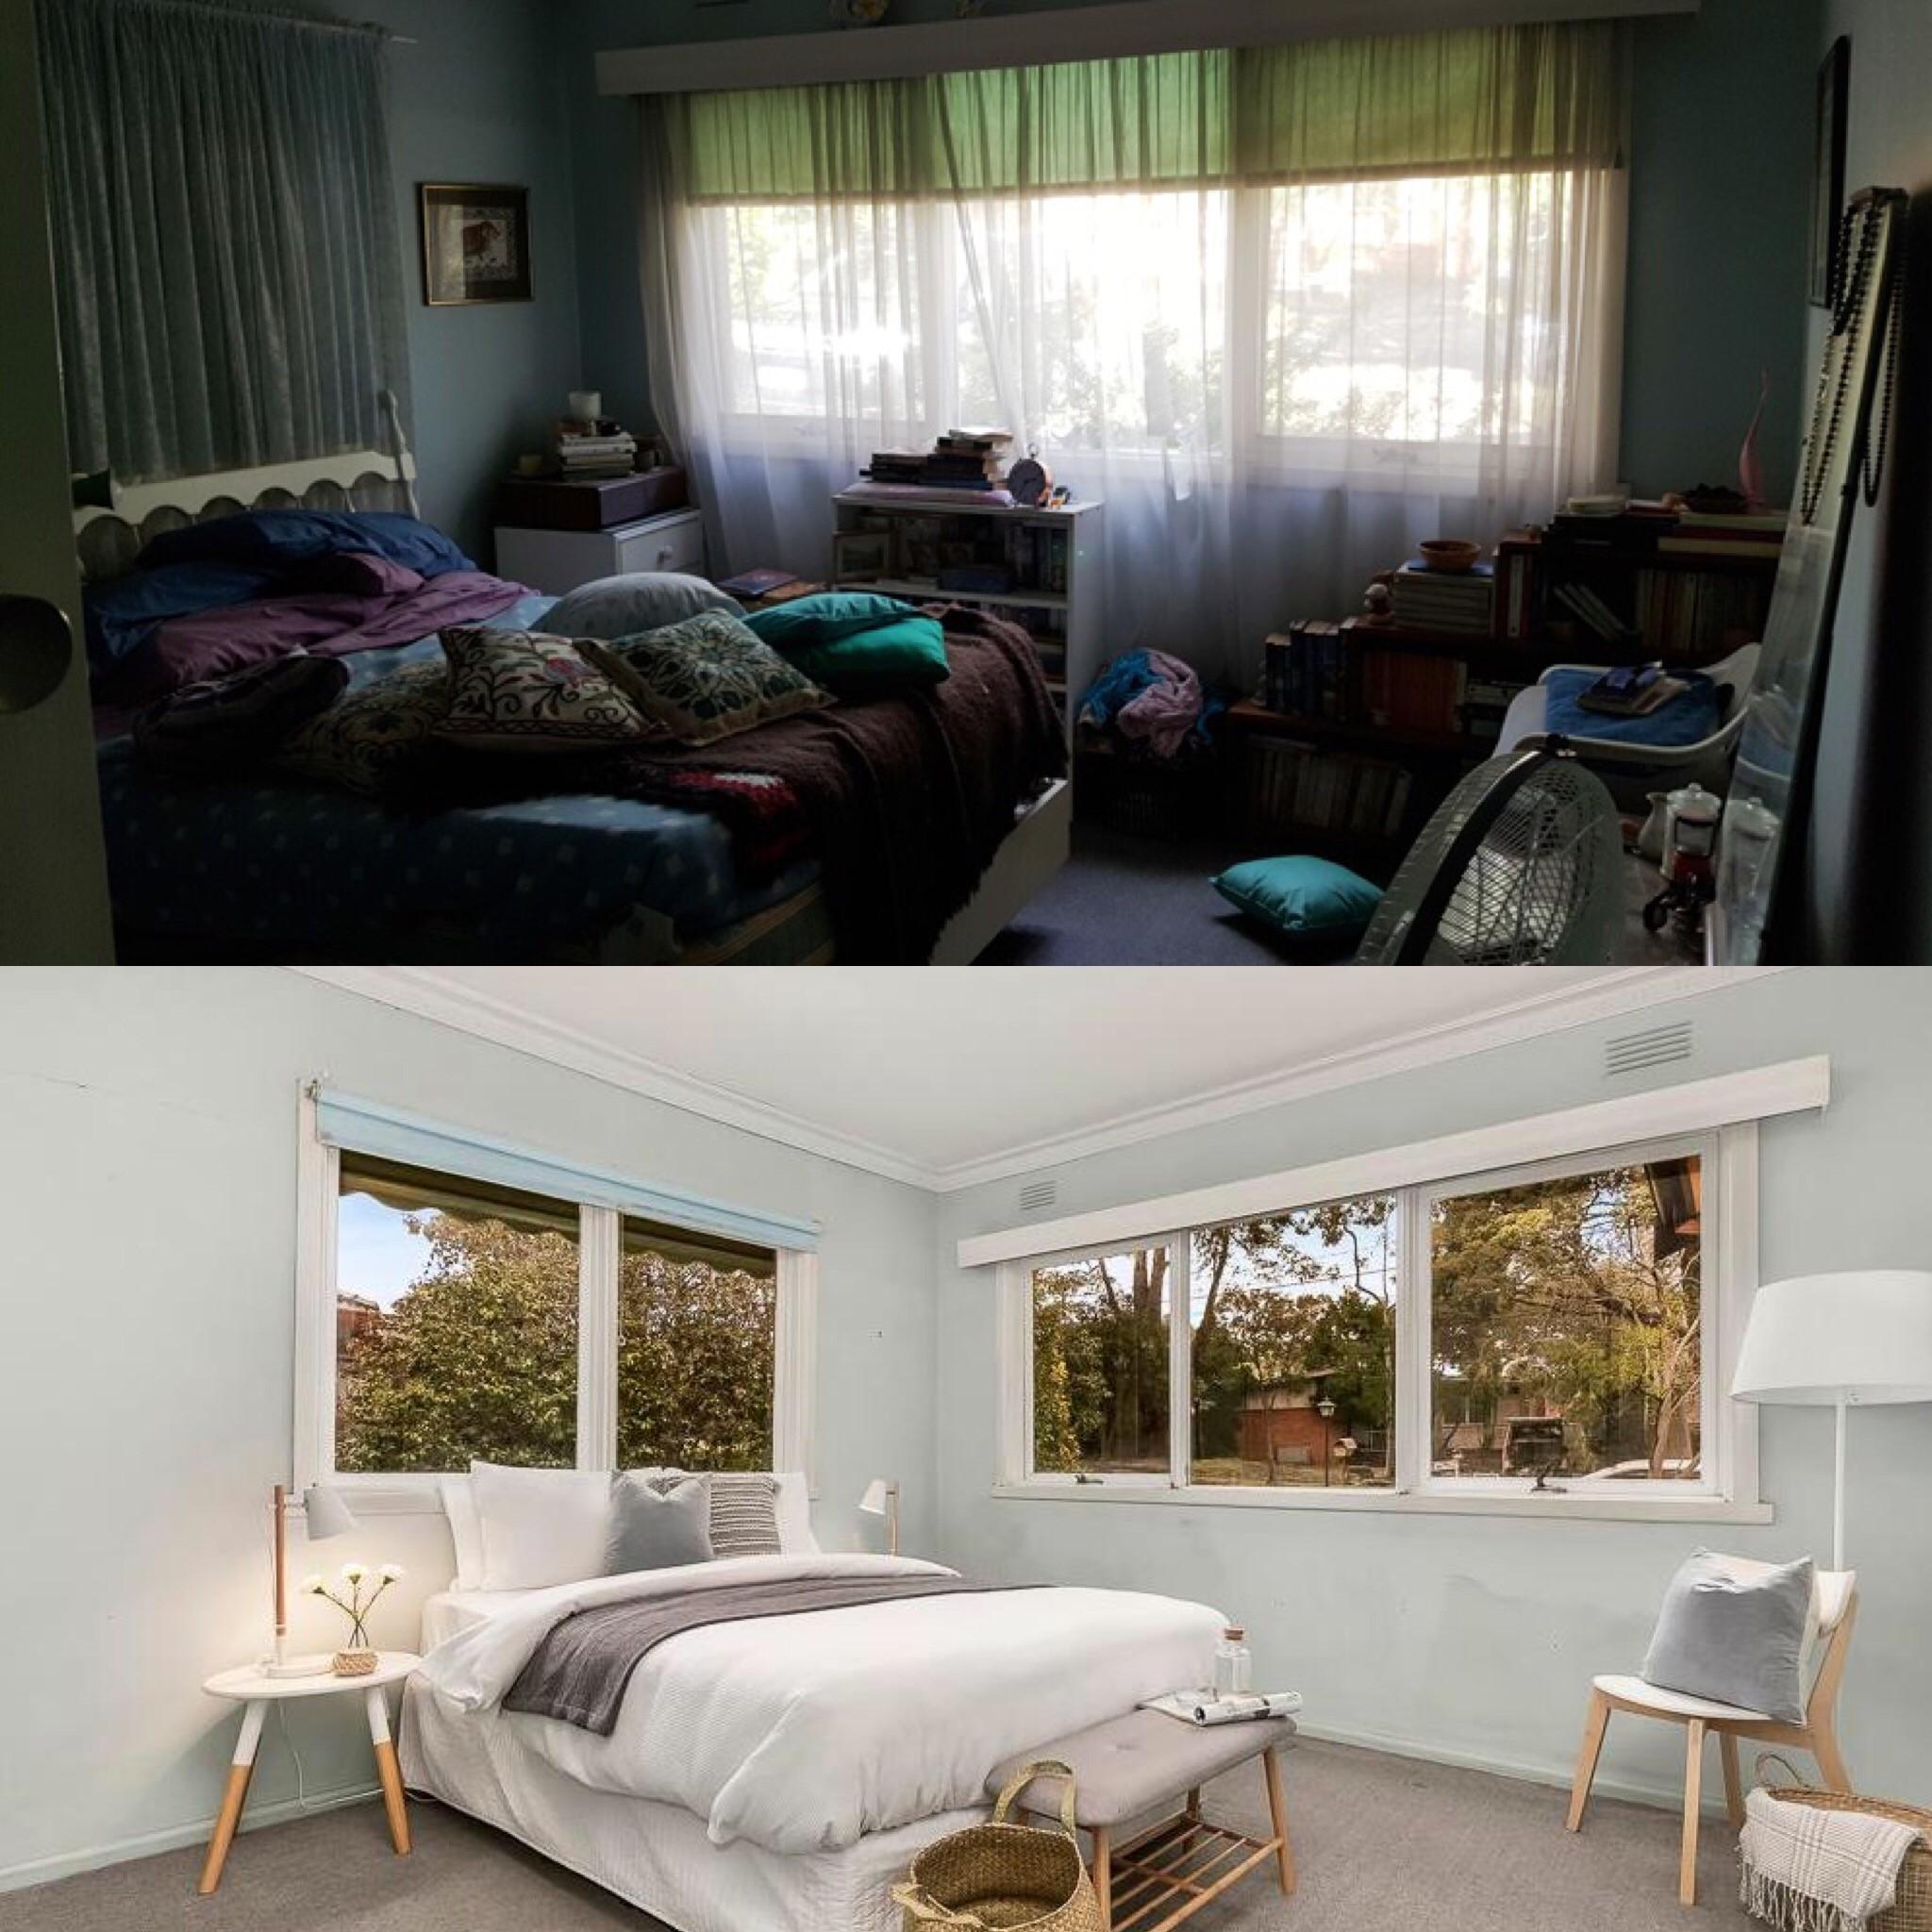 bedroom 4 before after 43 greenways.jpg